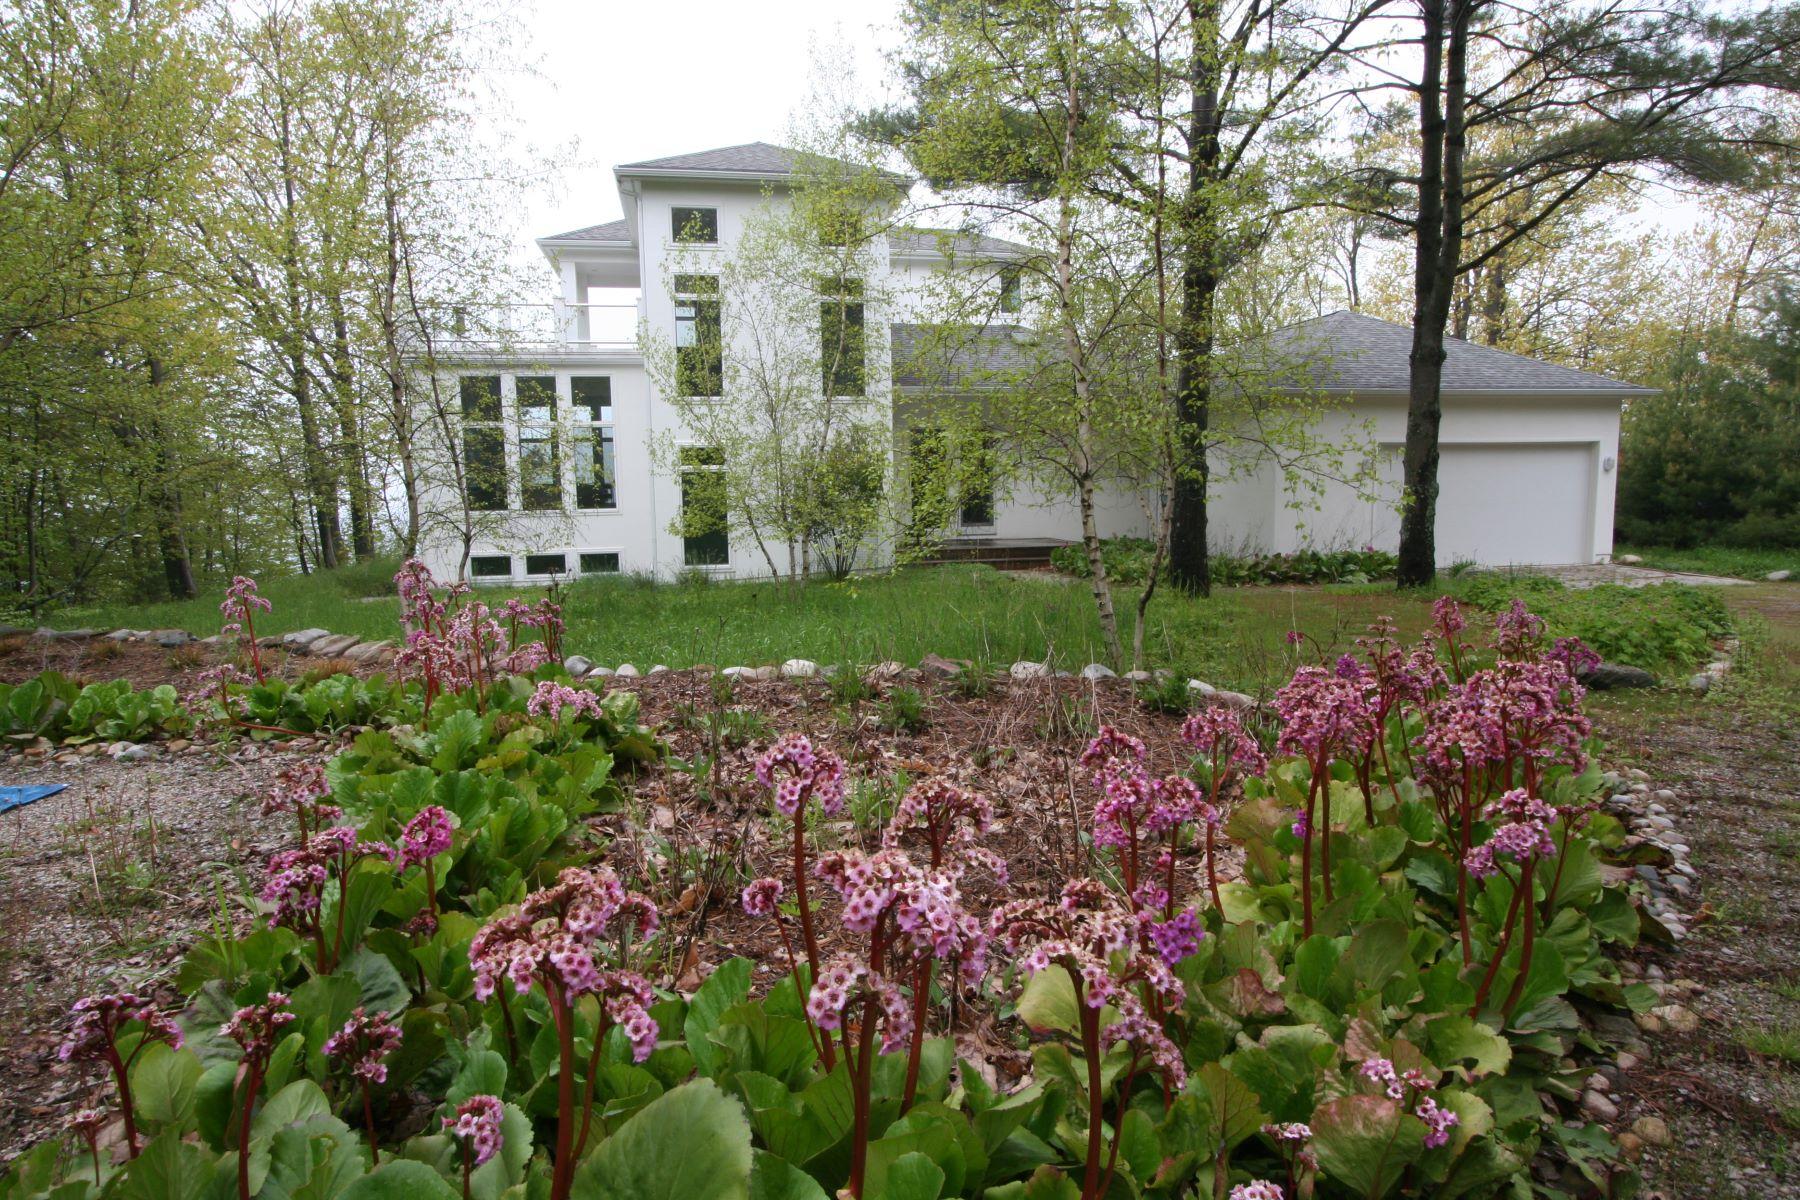 Single Family Homes for Active at Harbor Springs, Michigan 3485 N. Lake Shore Drive Good Hart, Michigan 49737 United States